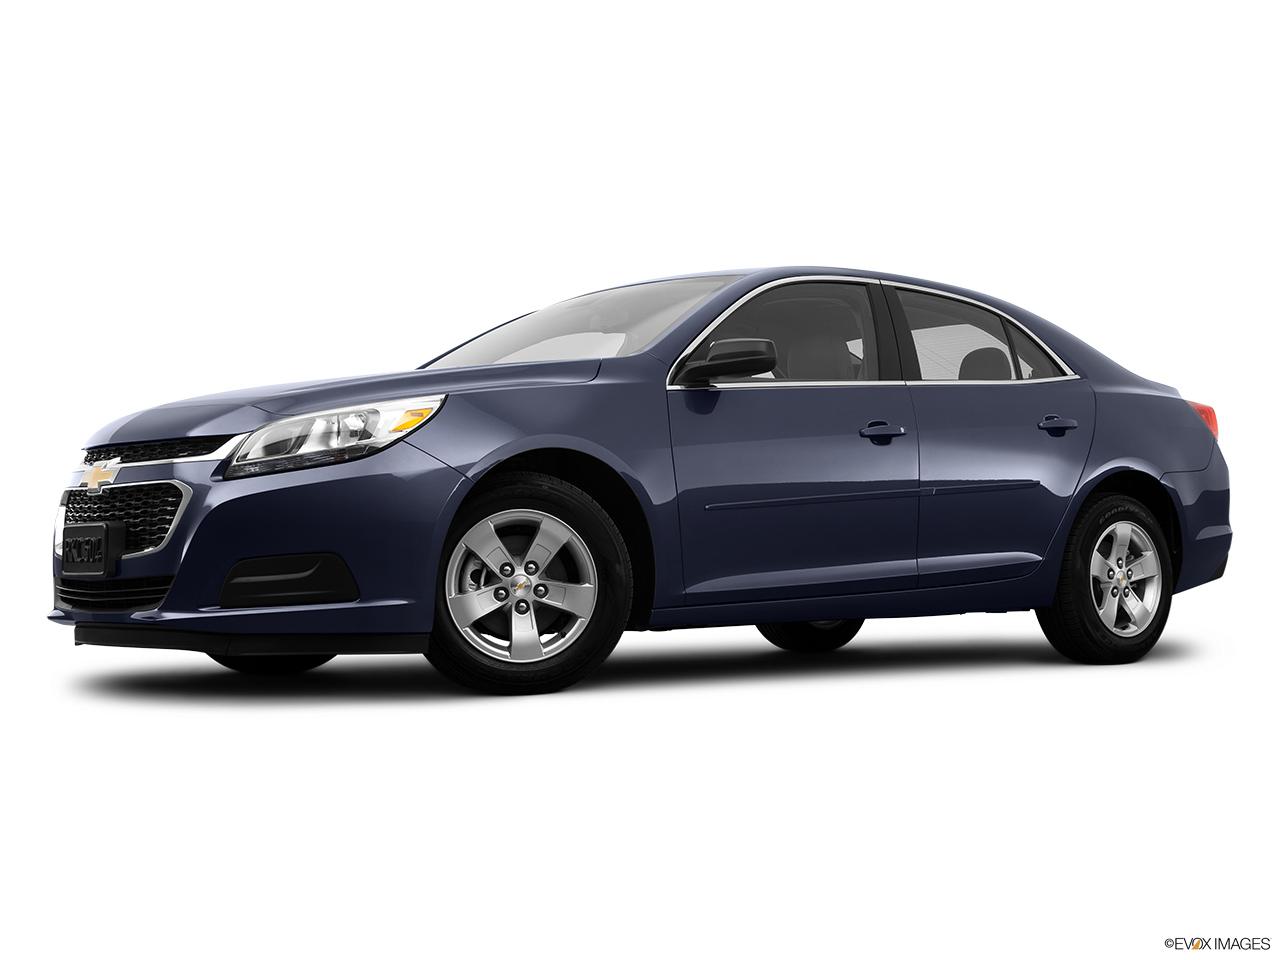 2014 Chevrolet Malibu Specs 4 Door Sedan Ls Specifications